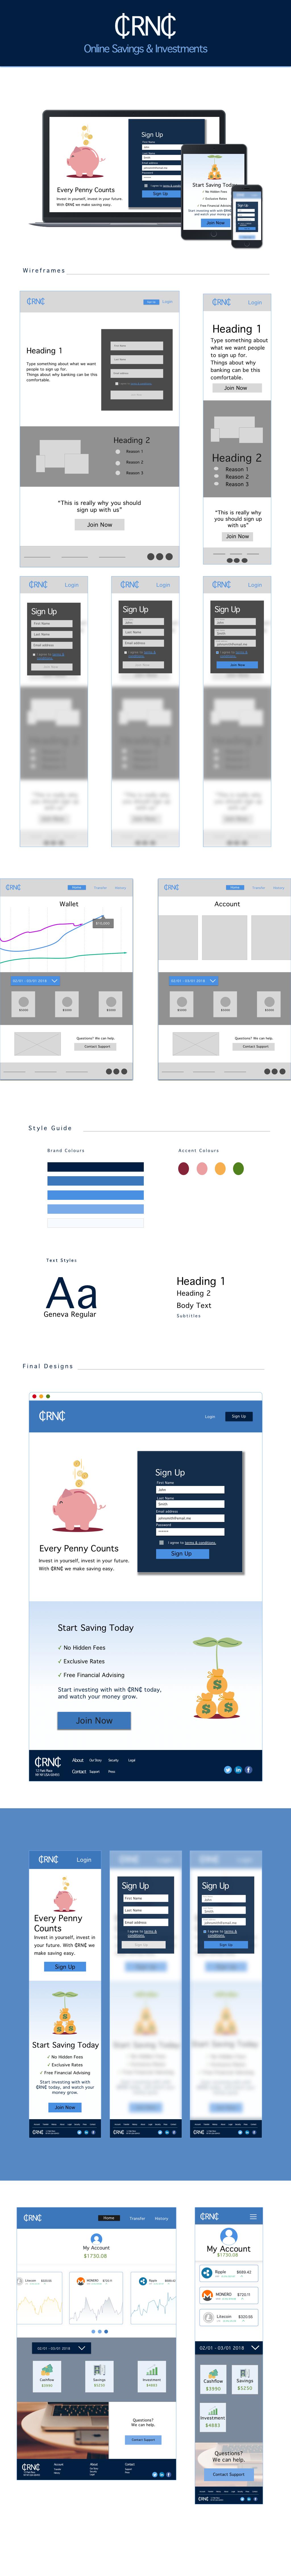 ux UI Web Design  Mobilebanking wireframes branding